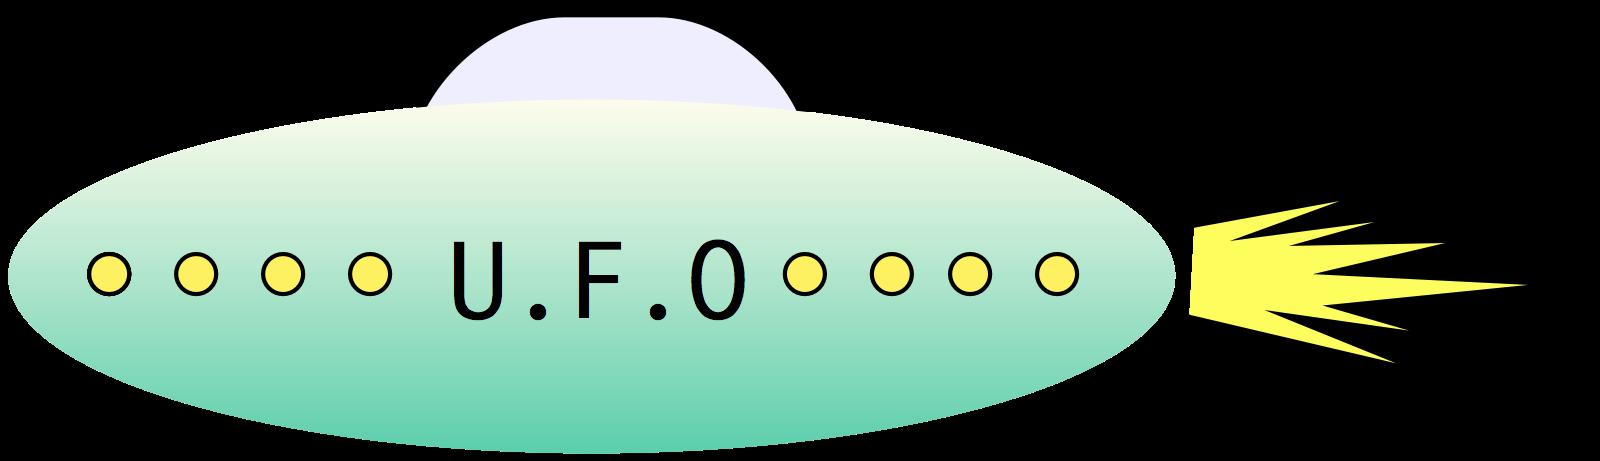 Ufo clipart green. Free cartoon k computer